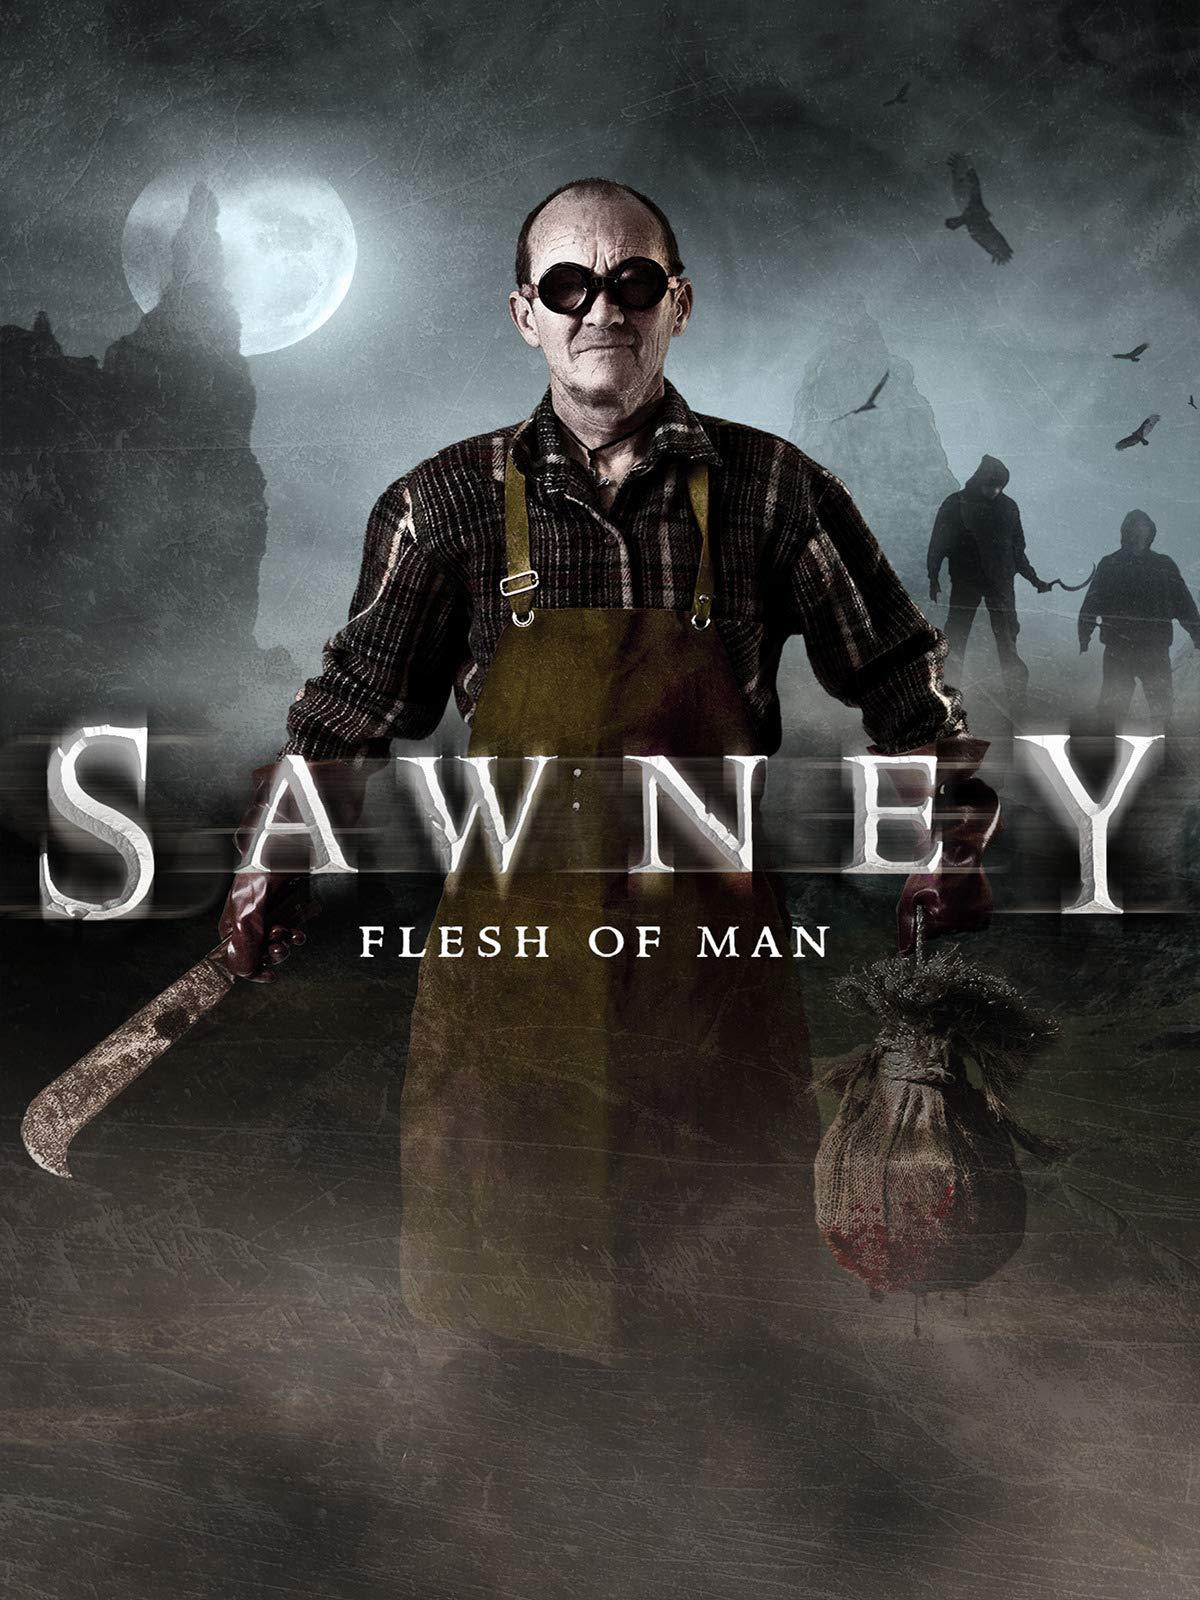 Sawney - Flesh of Man